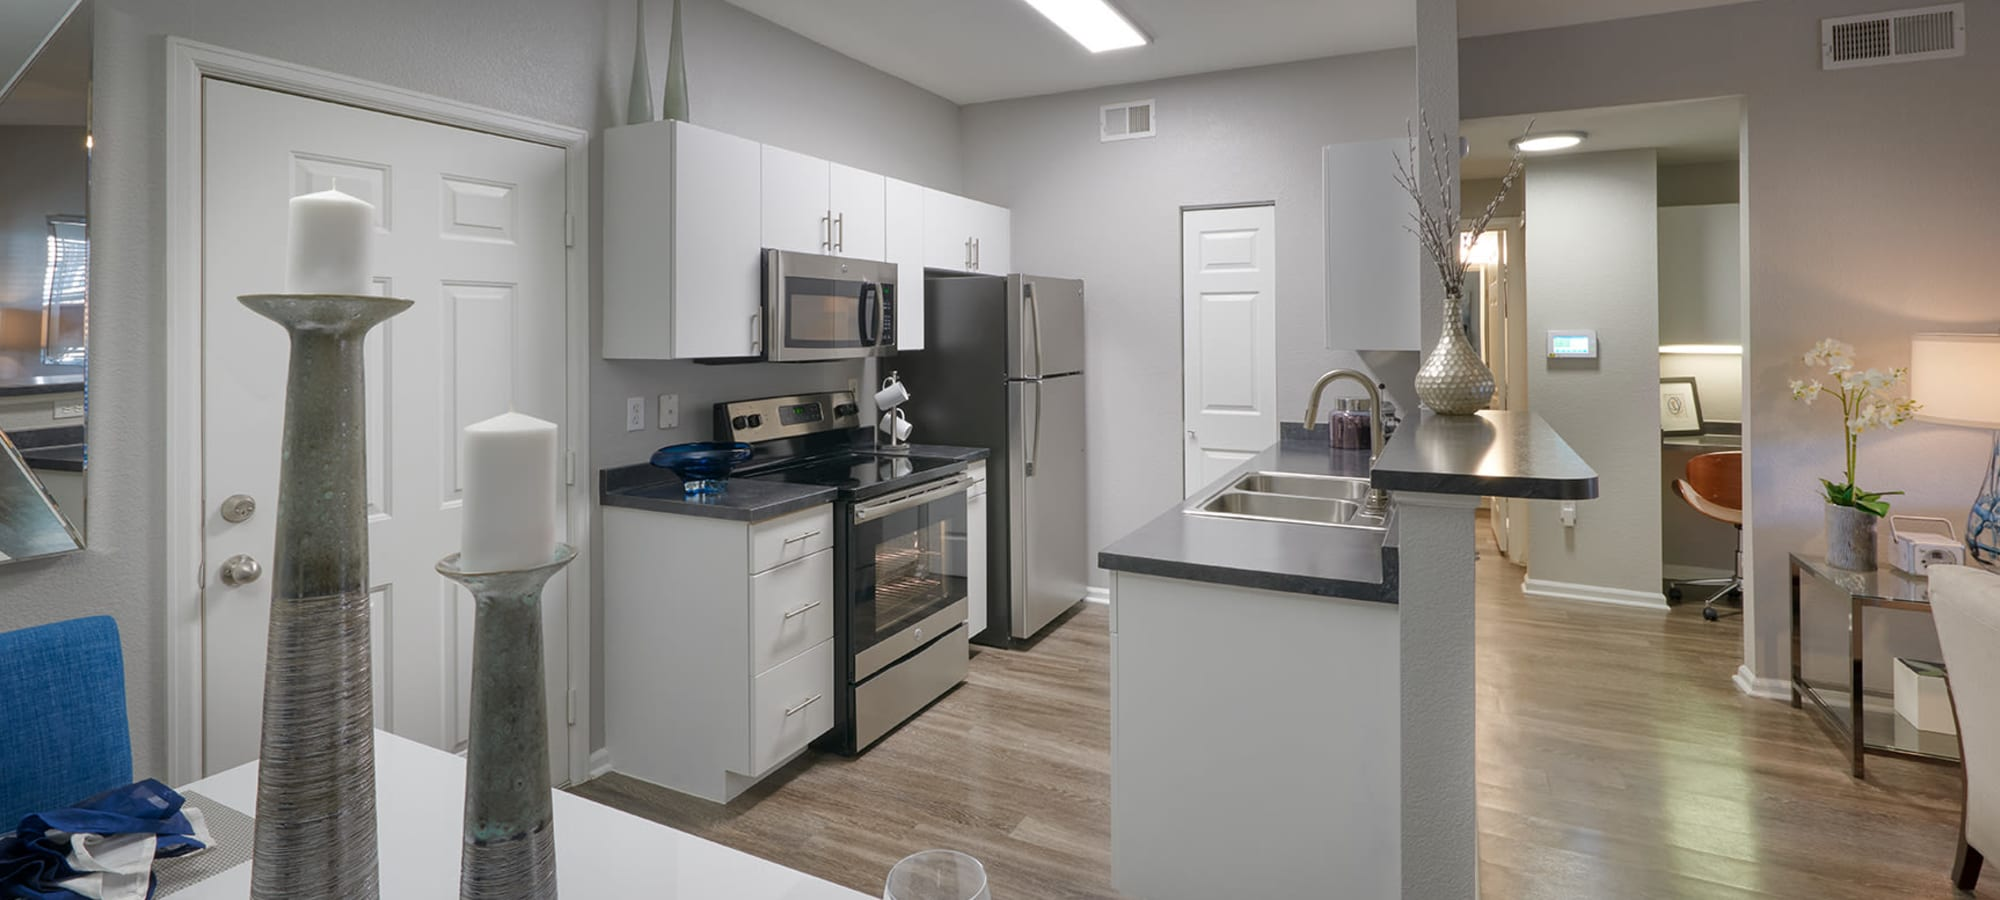 Crestone Apartments in Aurora, Colorado